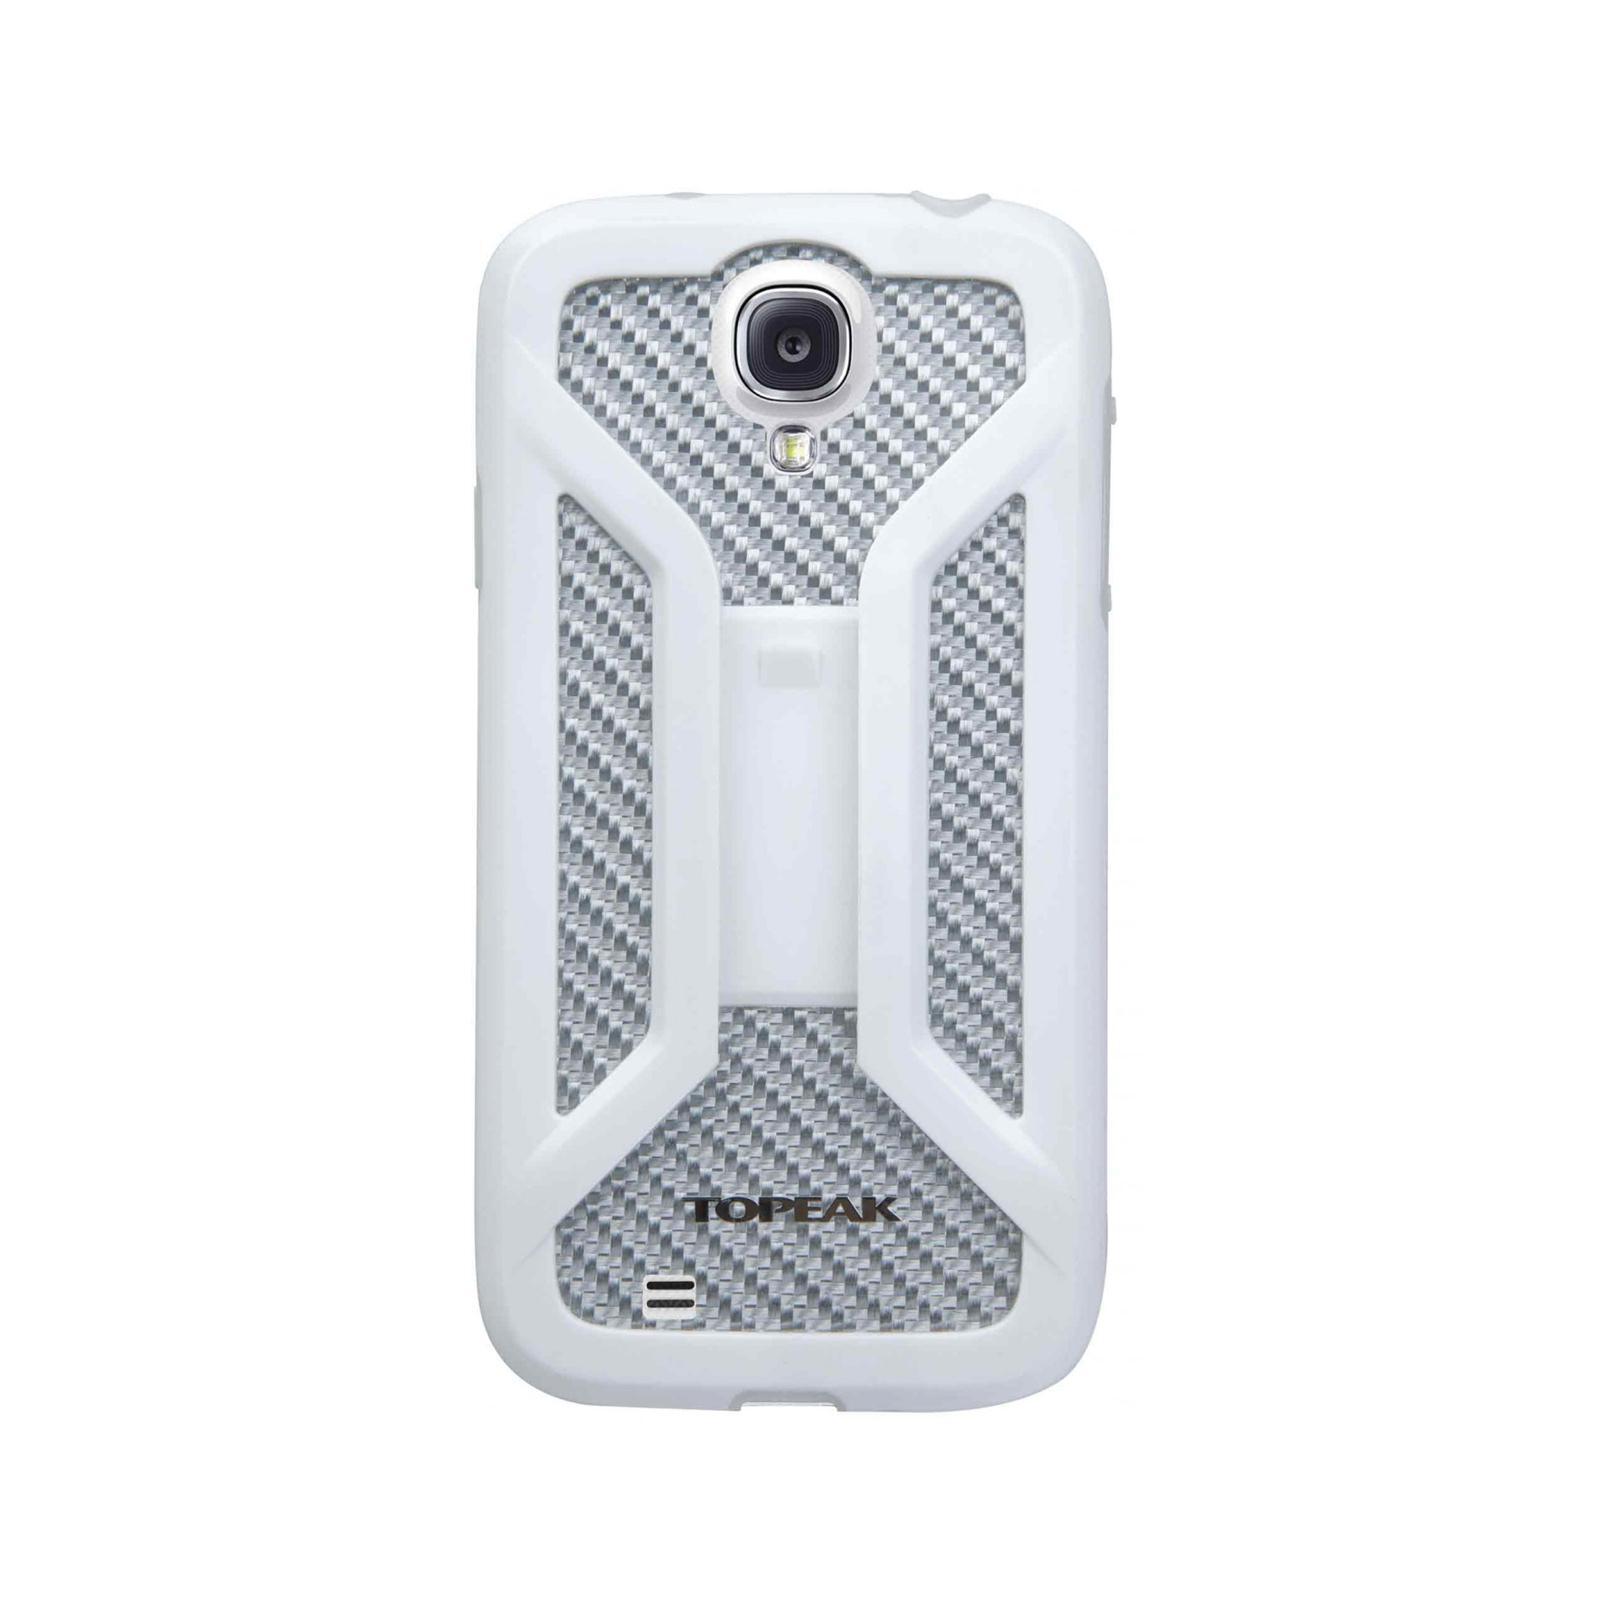 Topeak ride Case pour blanc samsung Galaxy s4 blanc pour sans support portable sac 1b4889